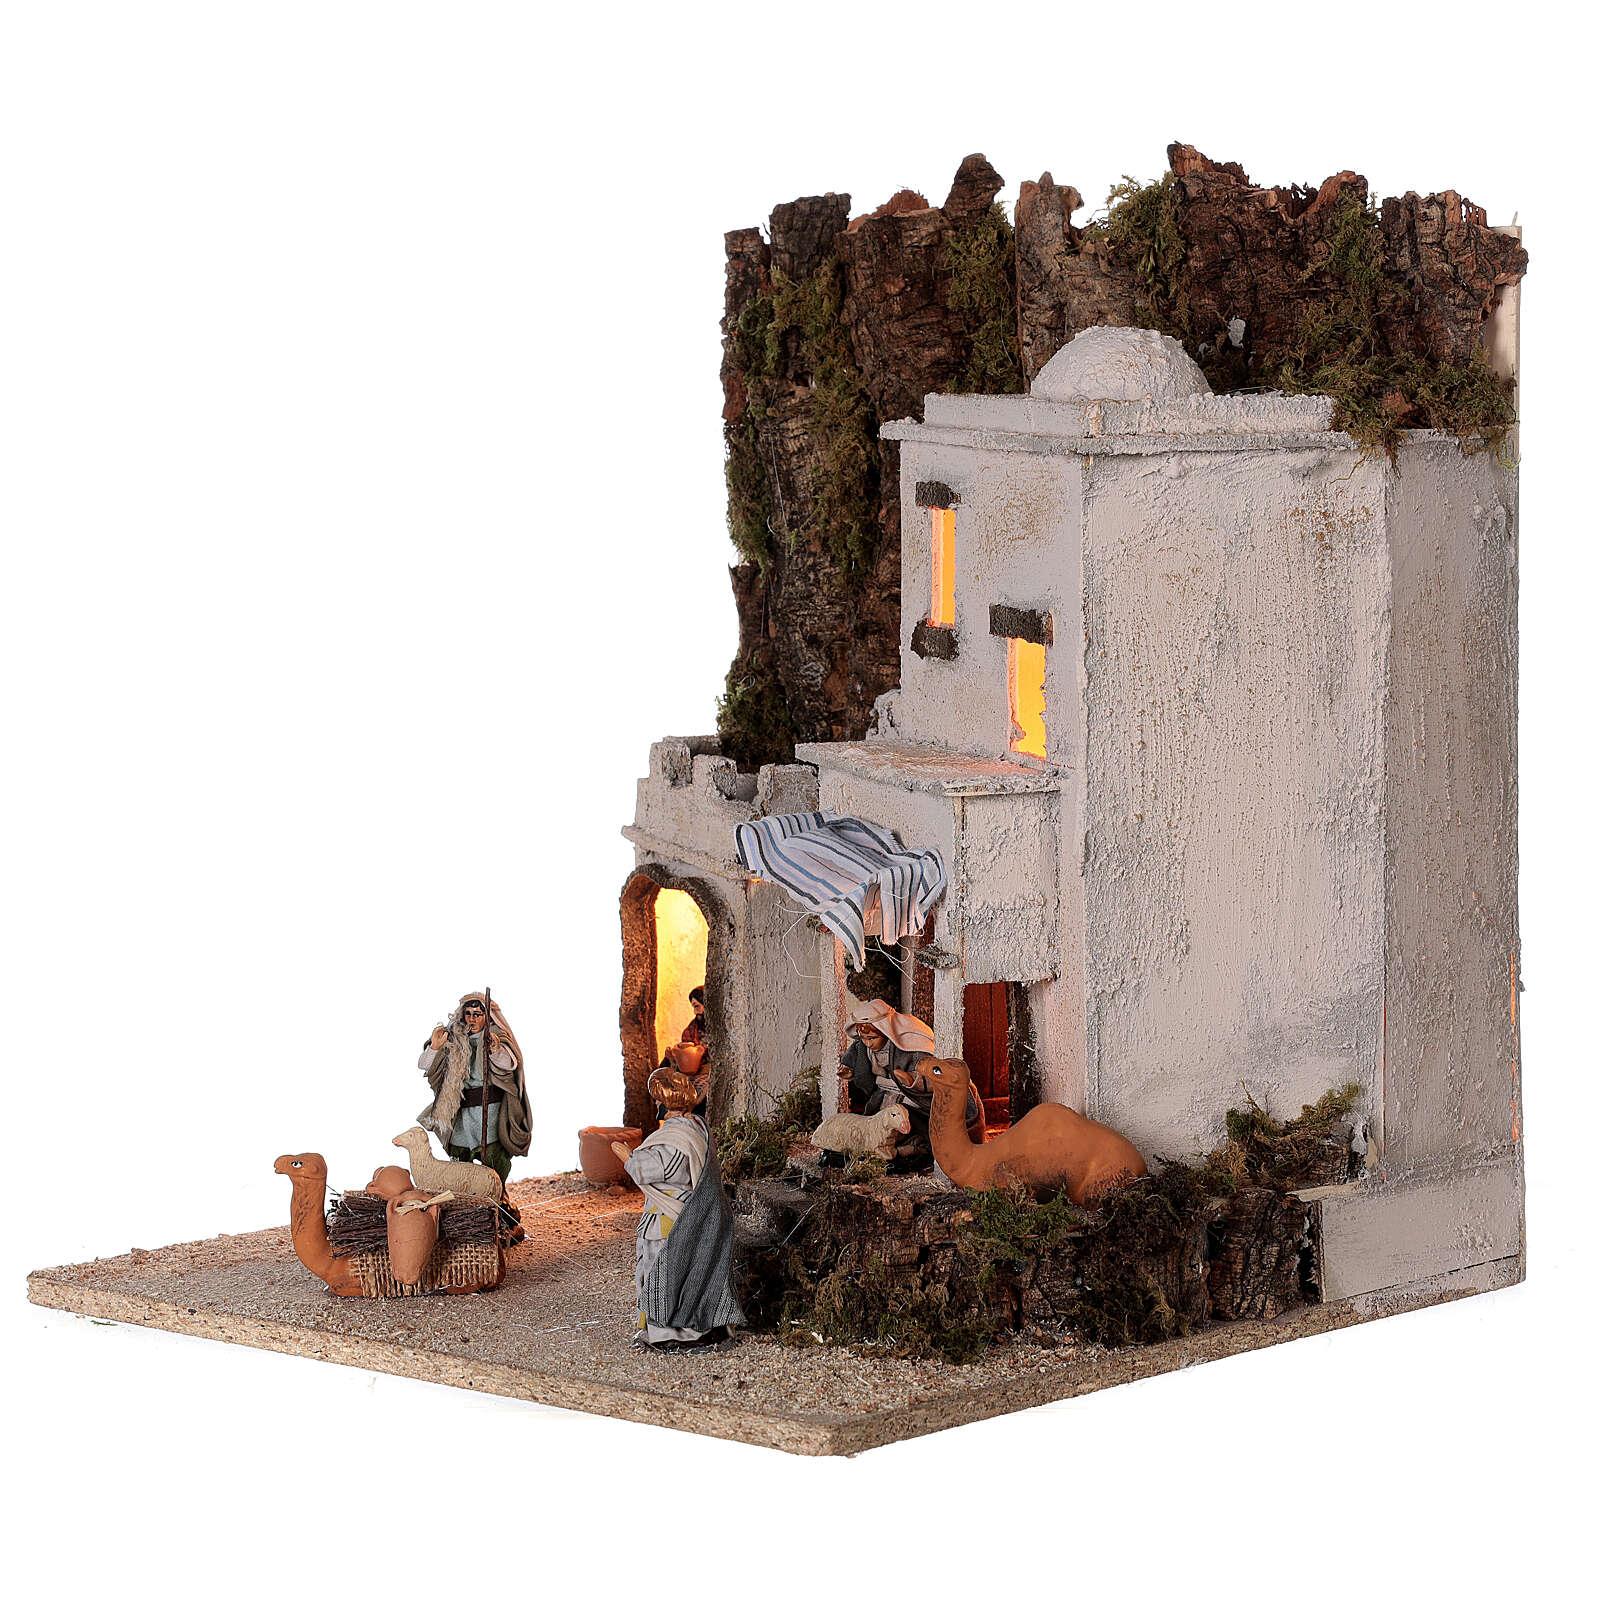 Borgo arabo (F) statue terracotta animali 8 cm presepe napoletano 35x35x35 cm 4